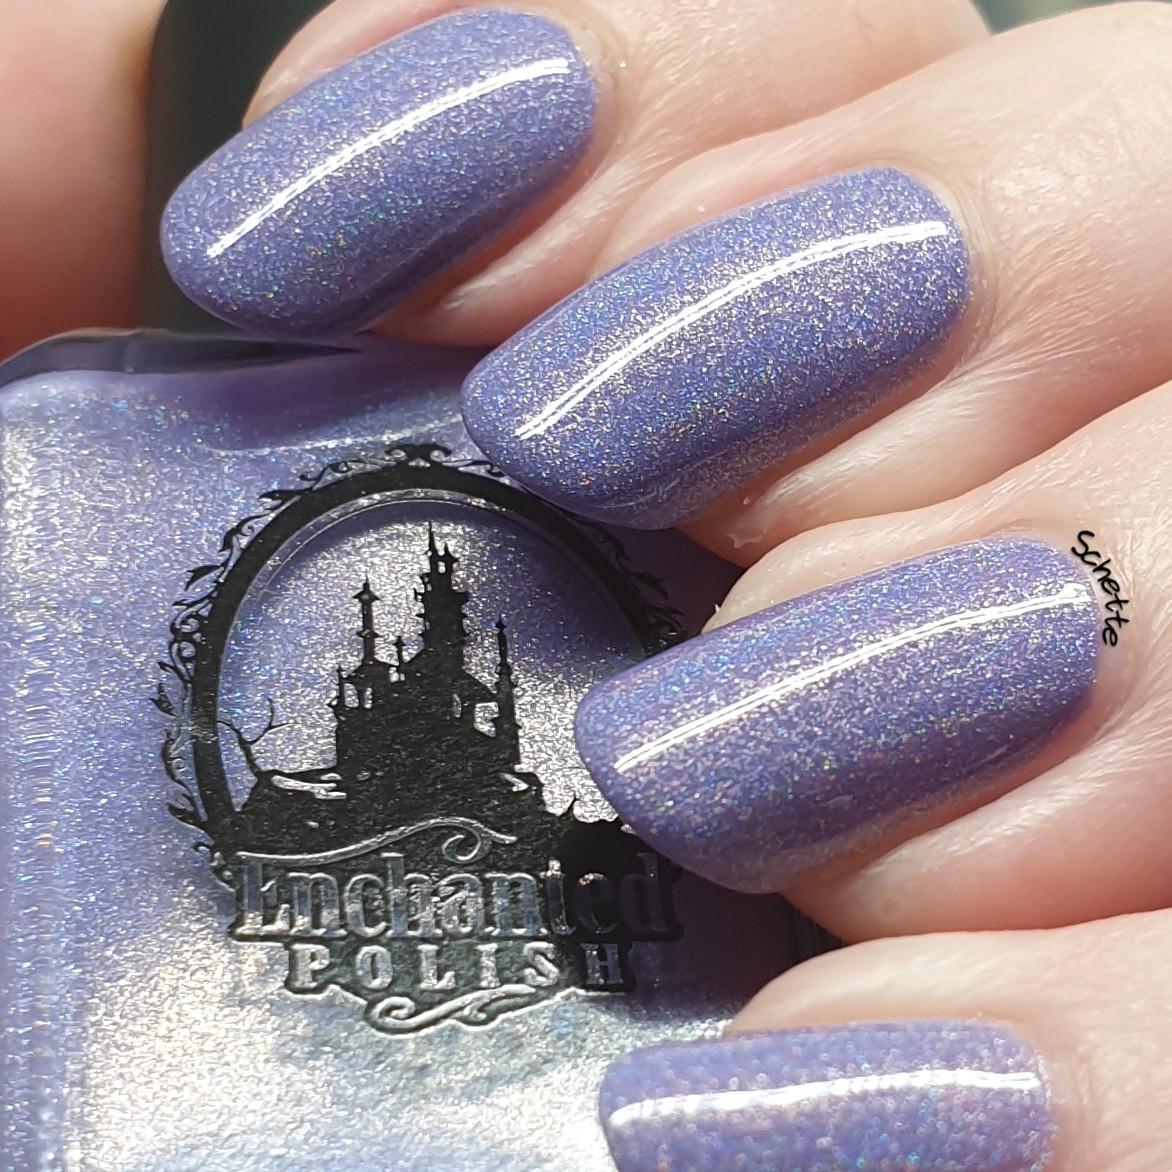 Enchanted Polish - Sugar Coated